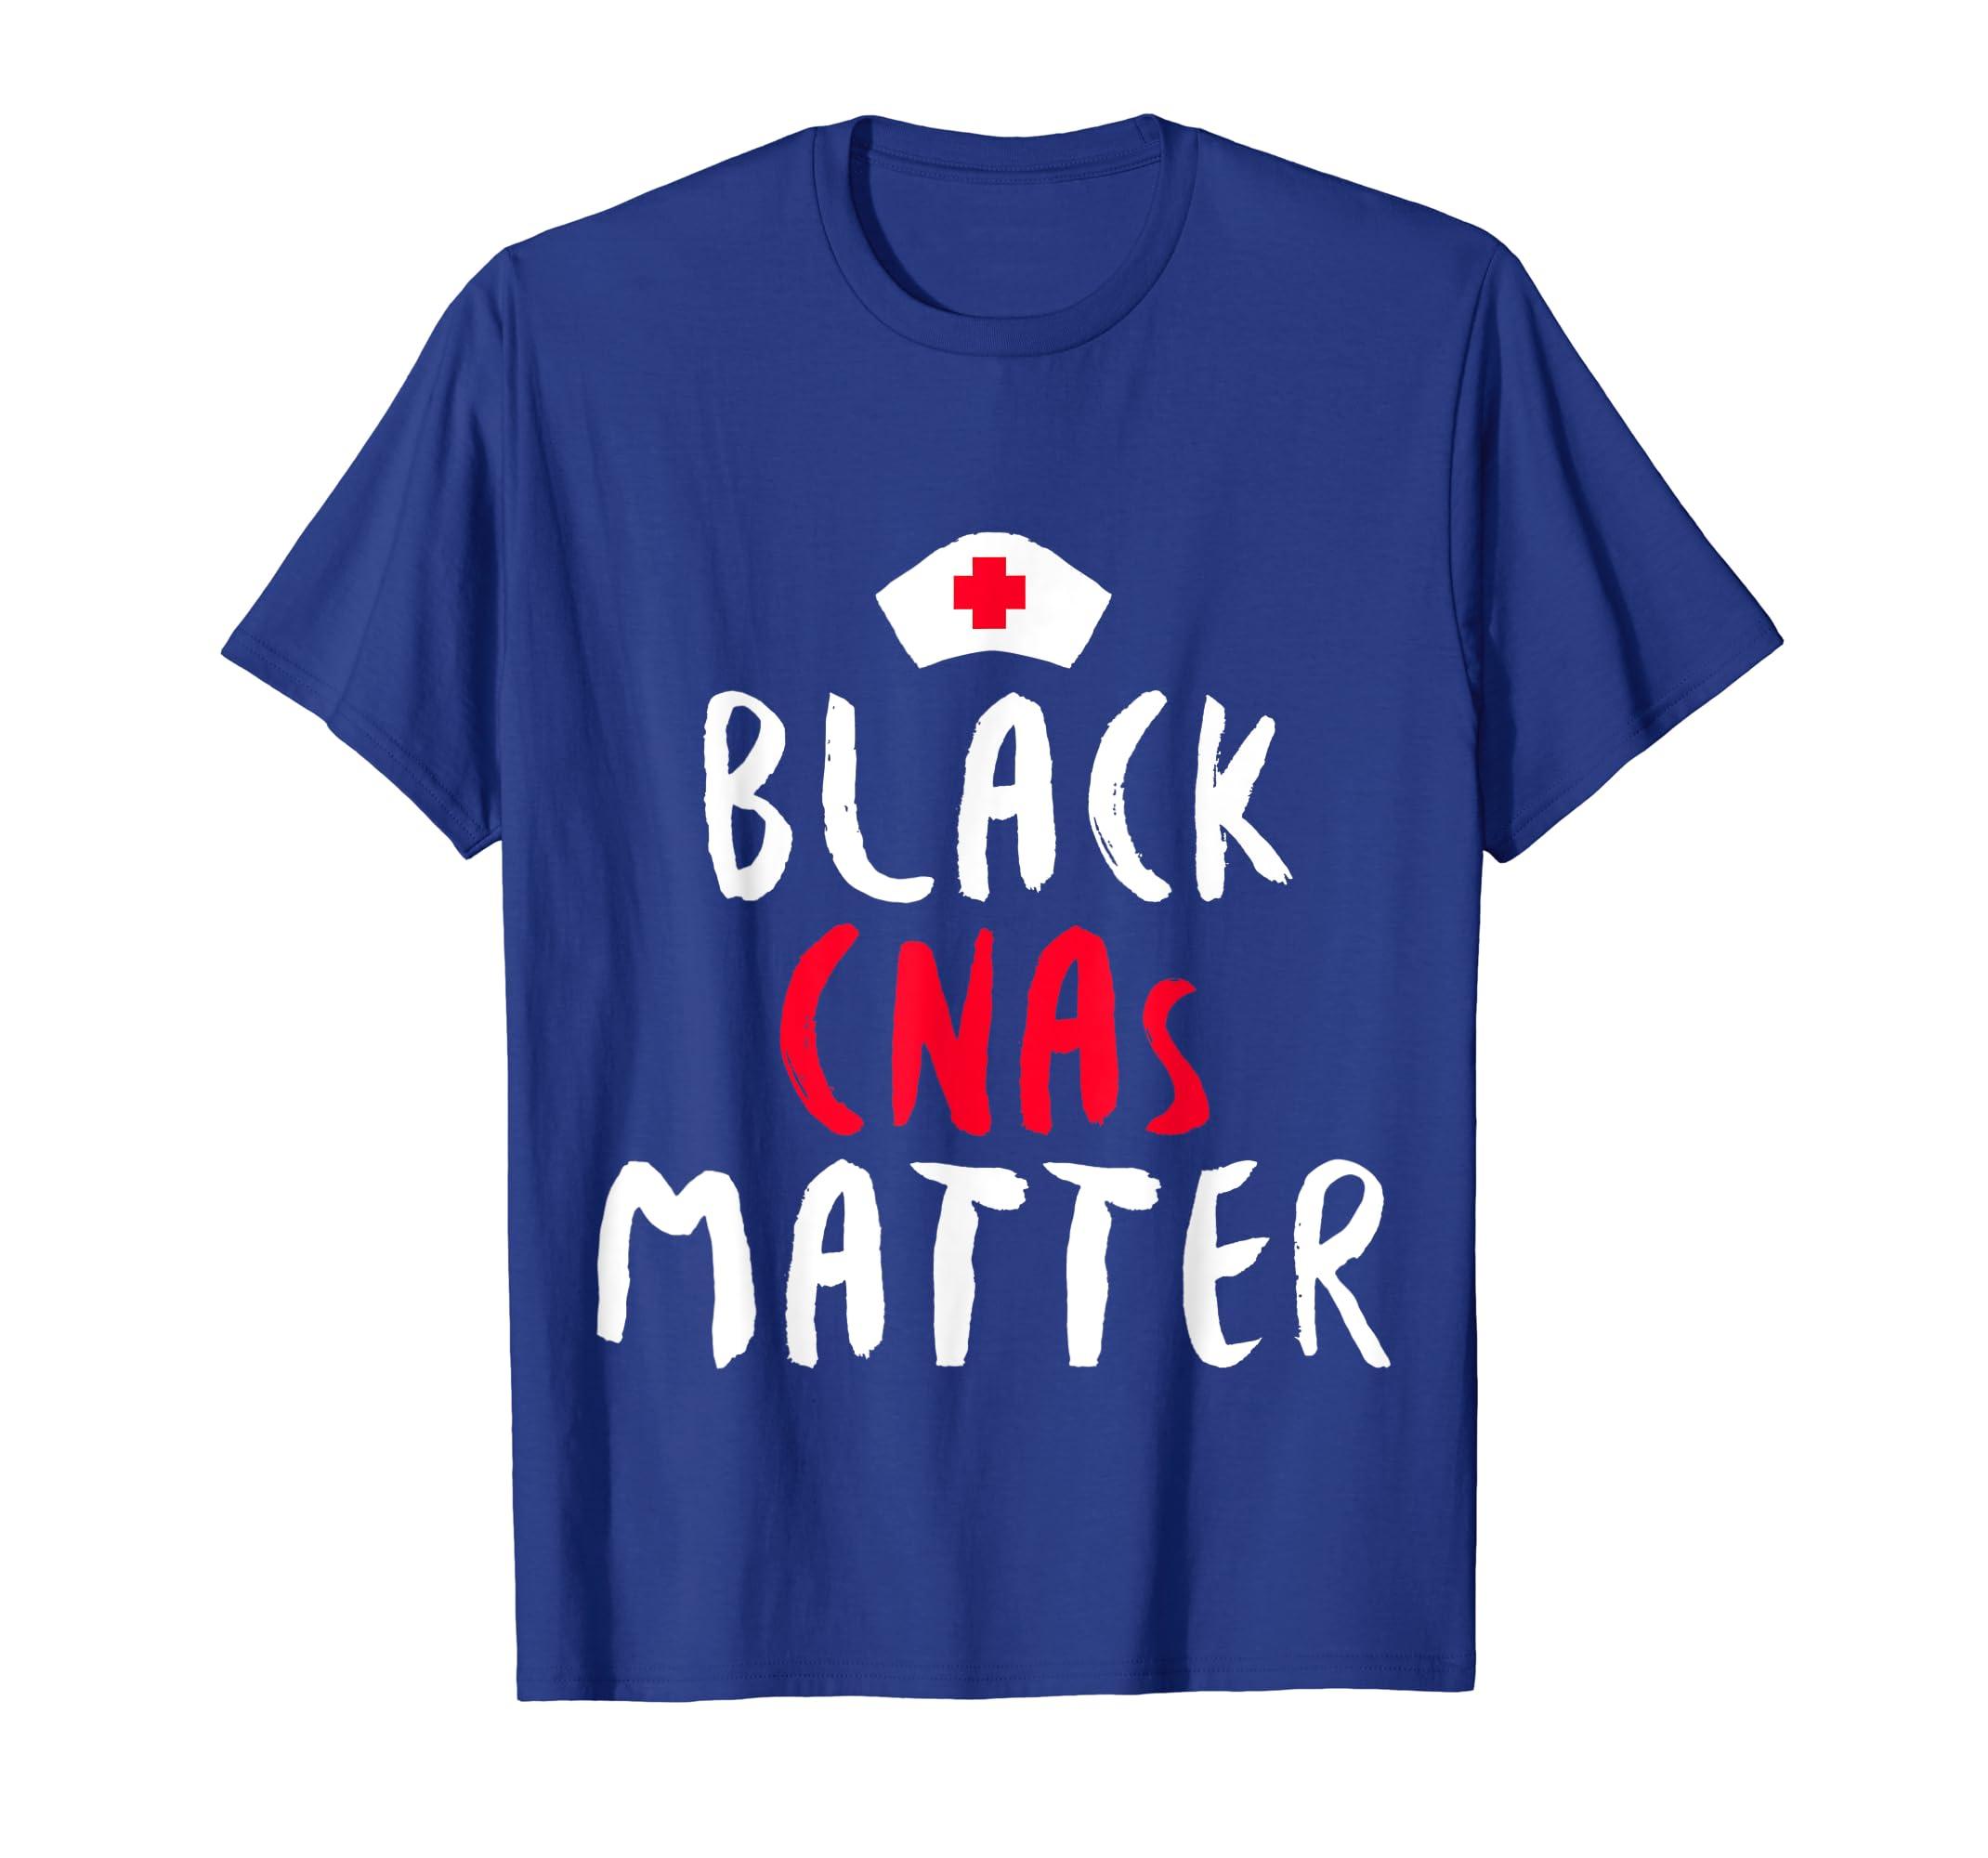 Black History Month CNA Nurse African American Pride T Shirt-SFL